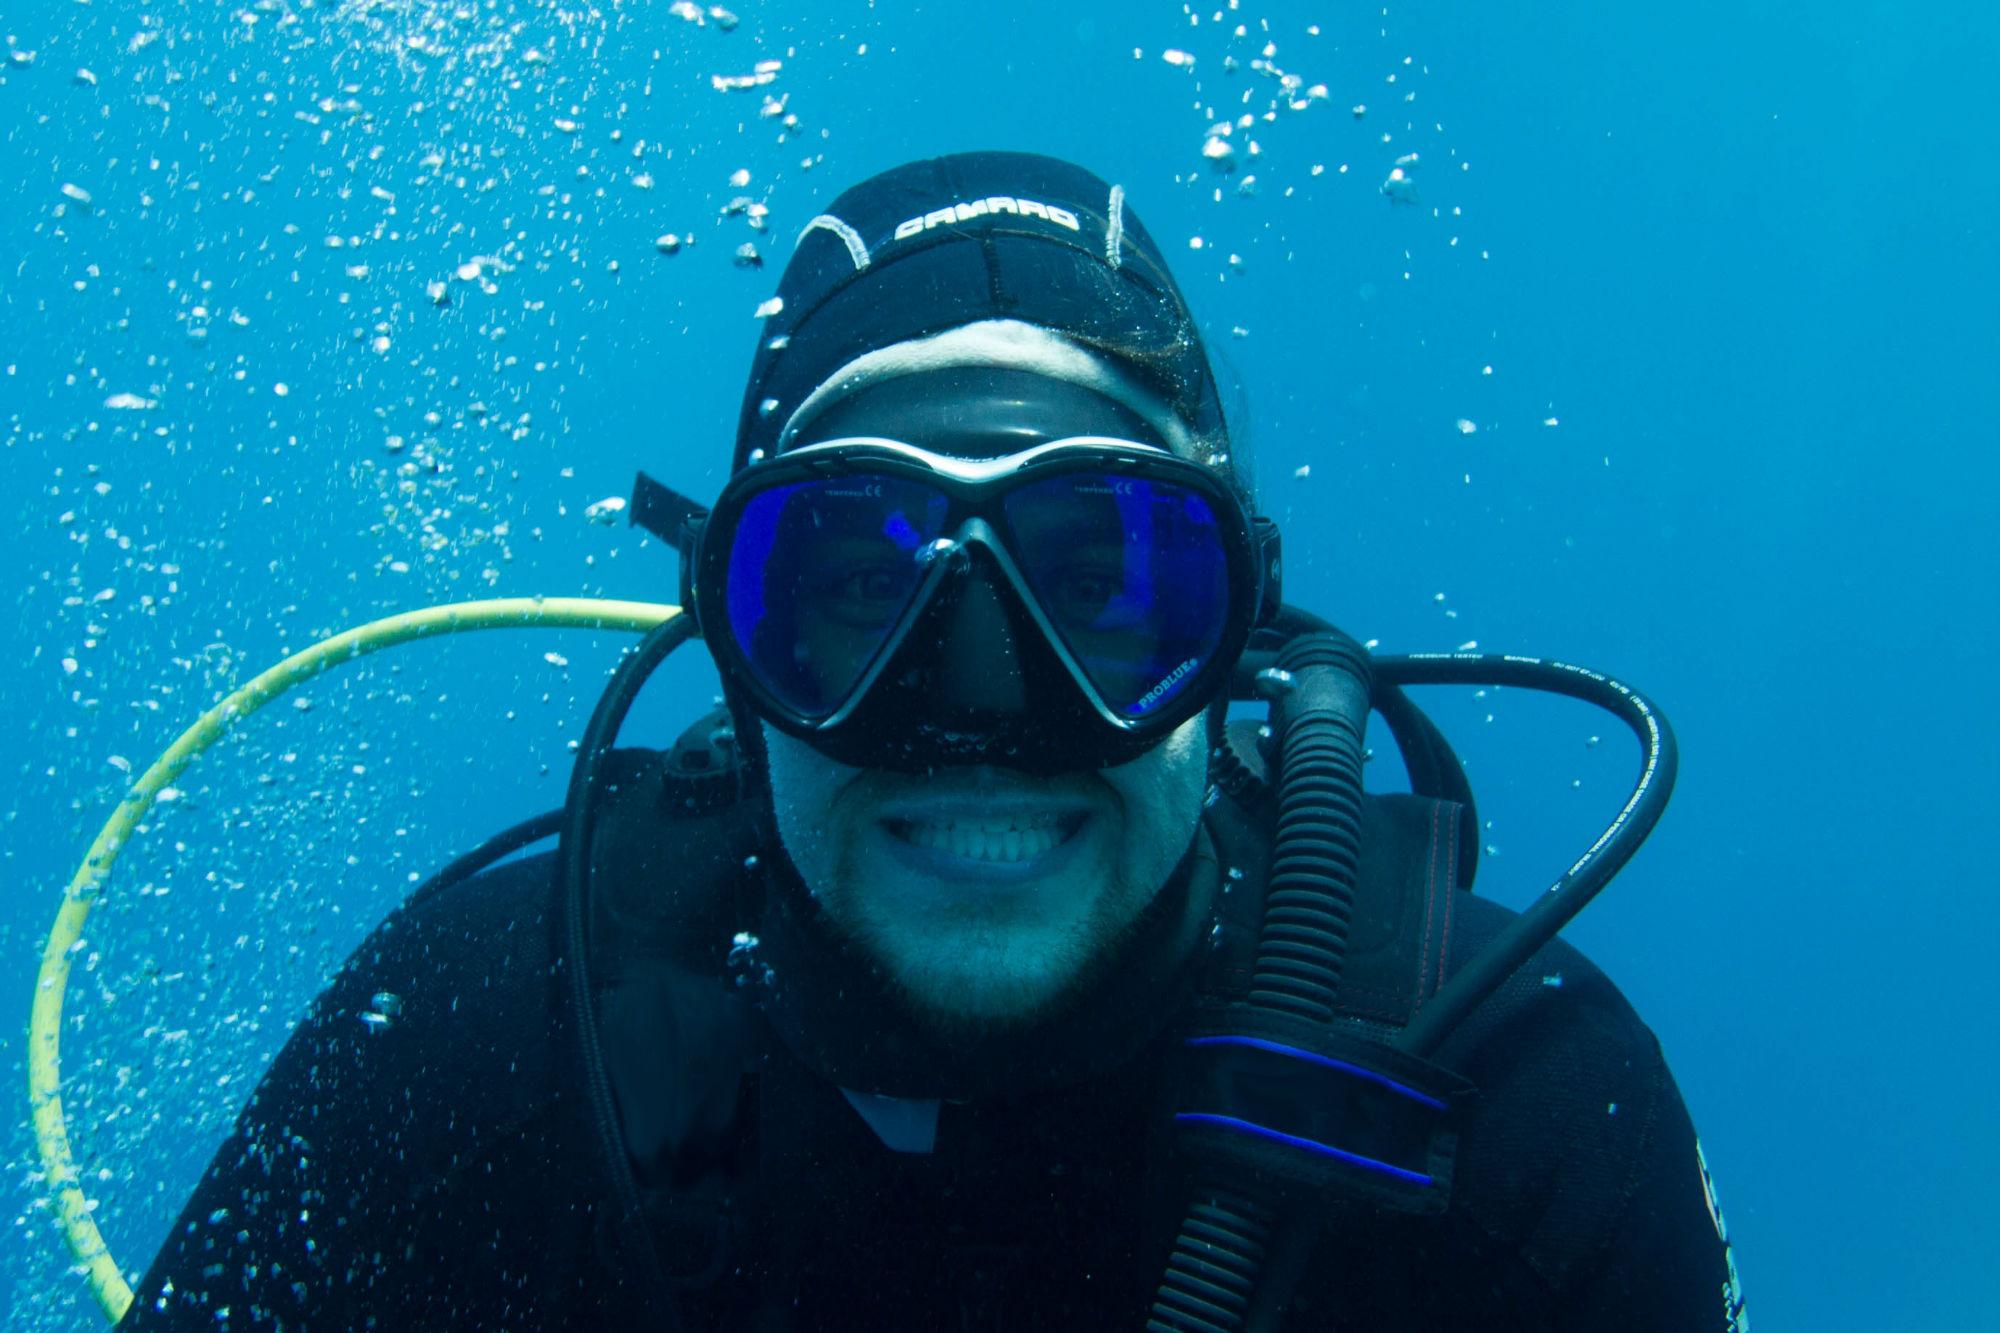 Joey's Underwater Scuba Selfie on Deer Island, Canada